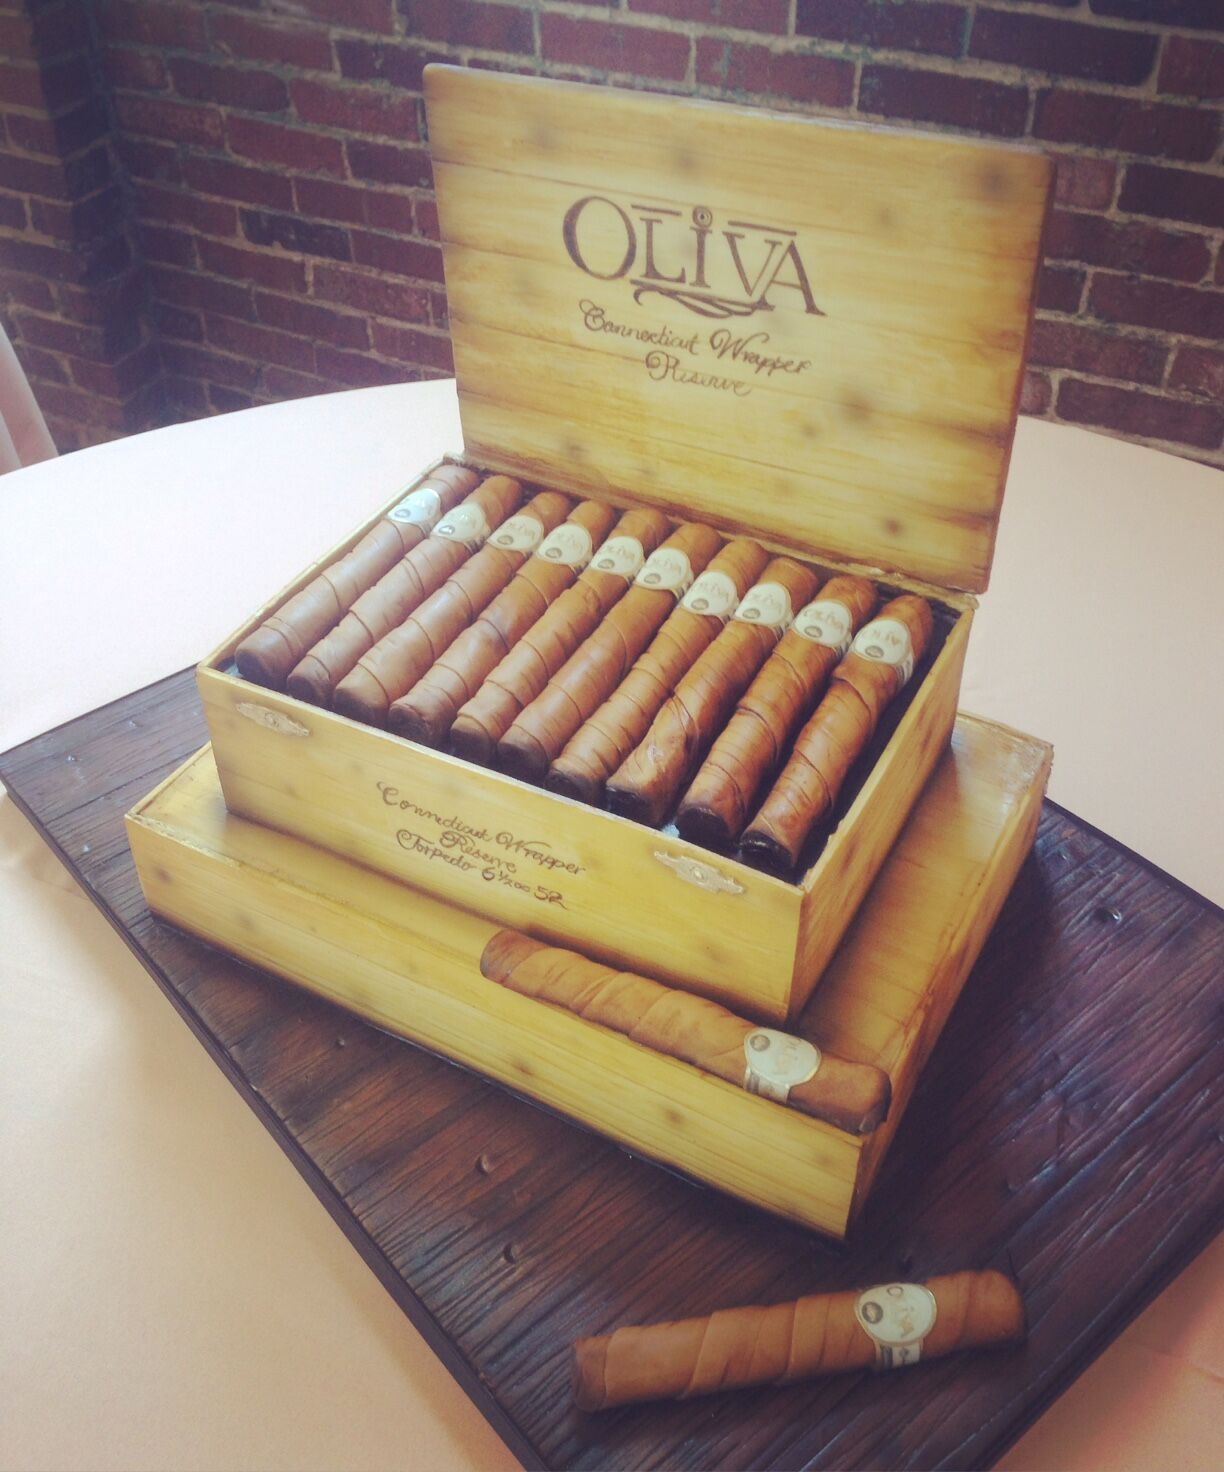 Artist Sarah Ono Jones Magpies Bakery Knoxville TN Custom Oliva Cigars And Box Fondant Grooms Cake Groomscake Wedding Olivaibrand Cigar